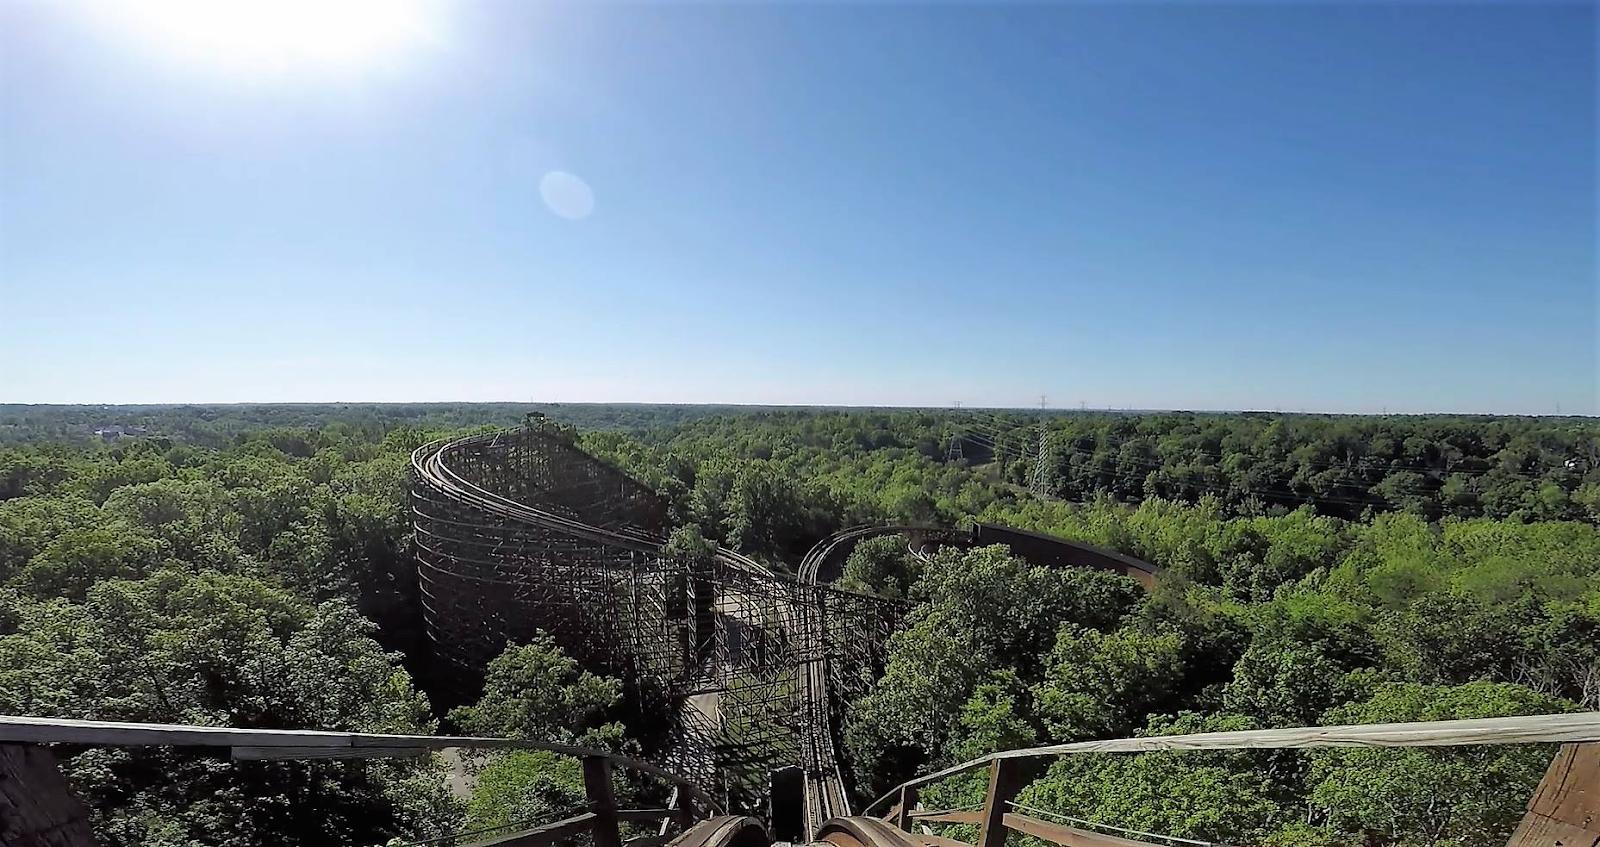 Kings Island Ohio Roller Coaster view